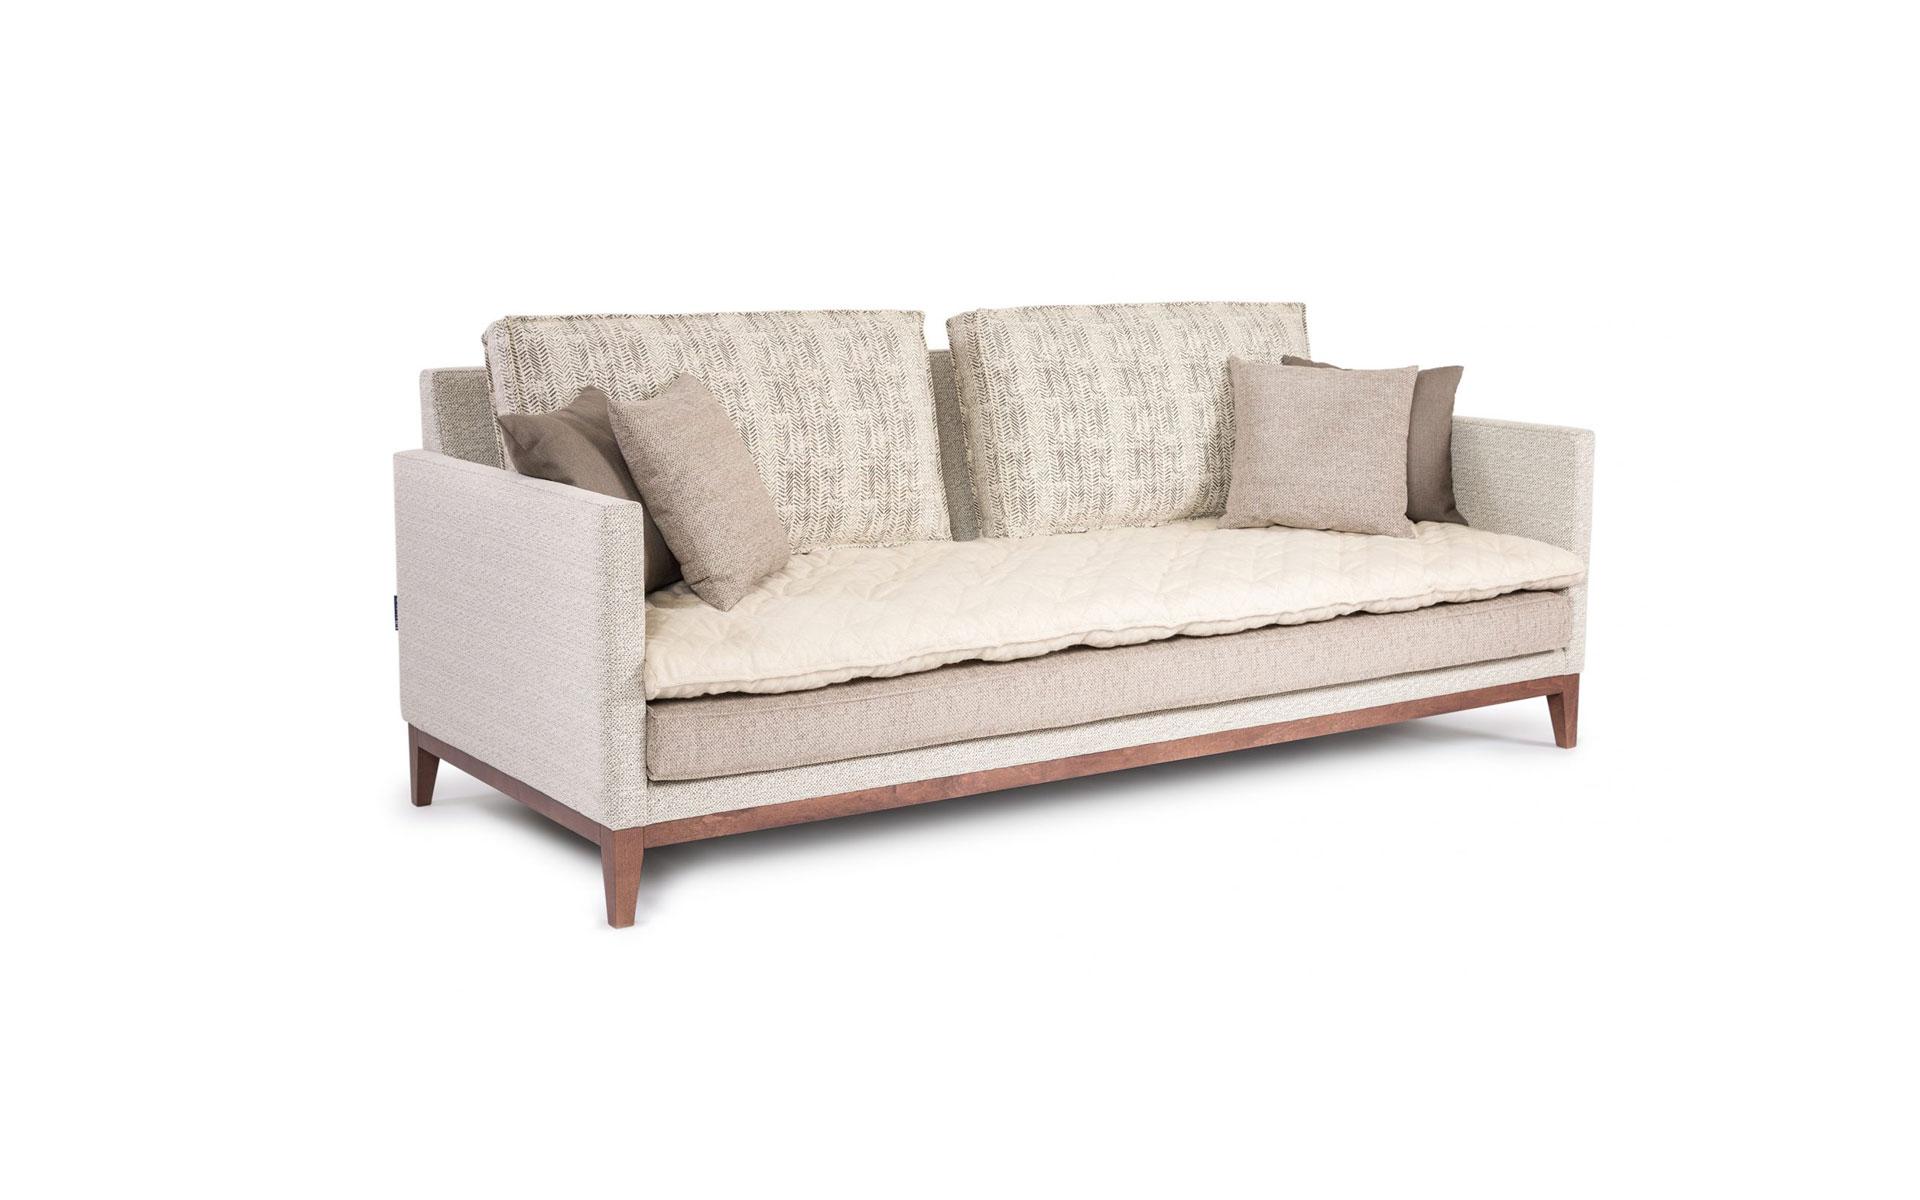 Canap sahara de ralph m raphaele meubles for M meuble canape